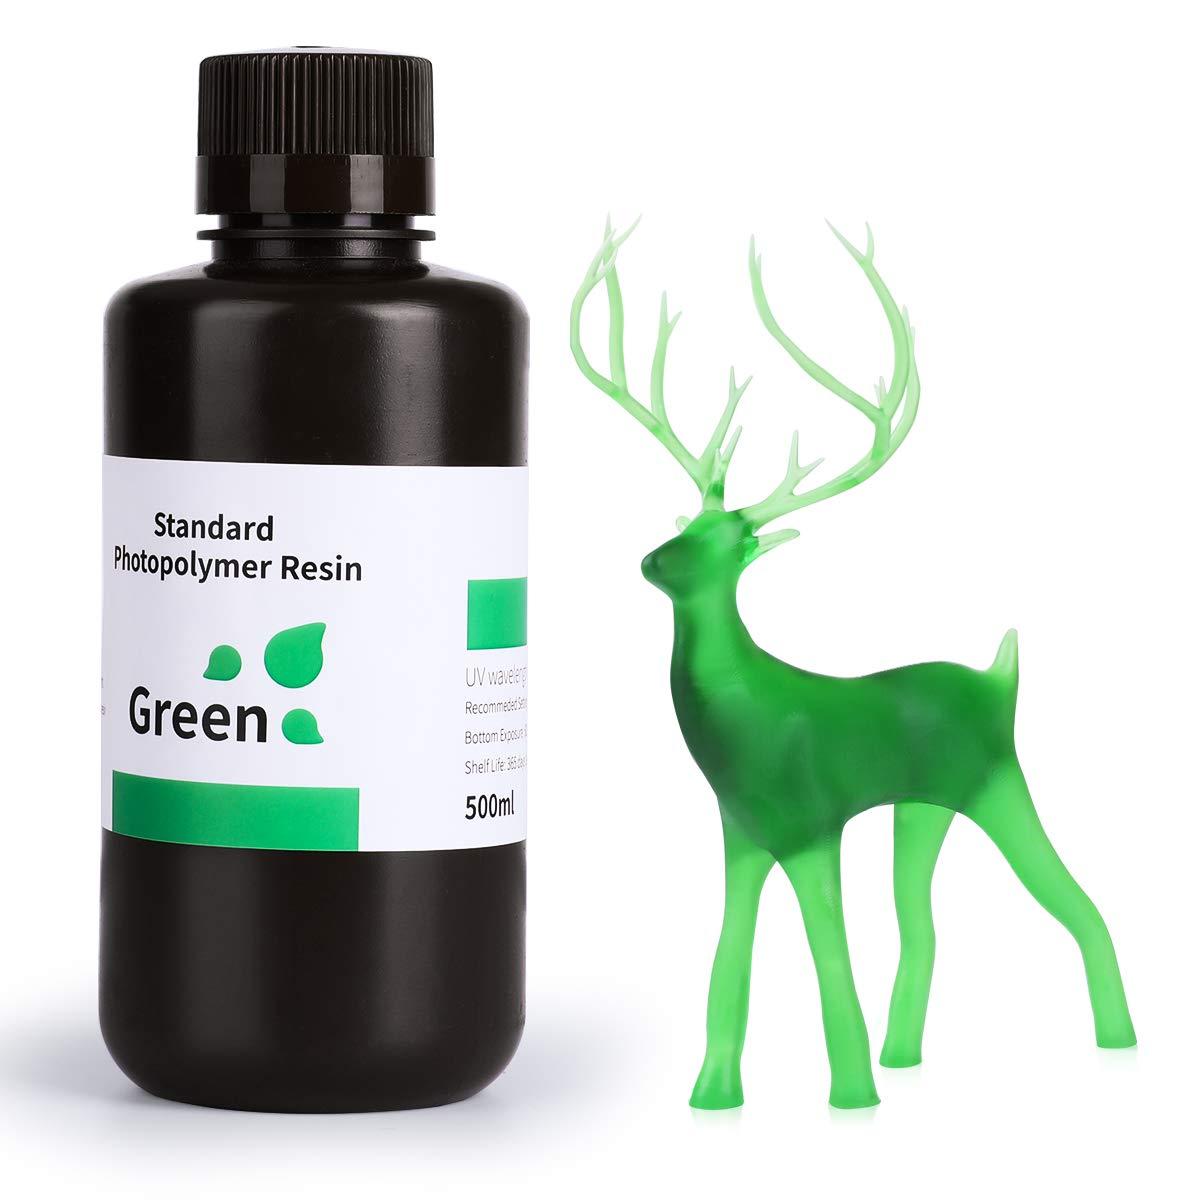 ELEGOO 3D Rapid Resin LCD UV-Curing Resin 405nm Standard Photopolymer Resin for LCD 3D Printing Clear Green 500g